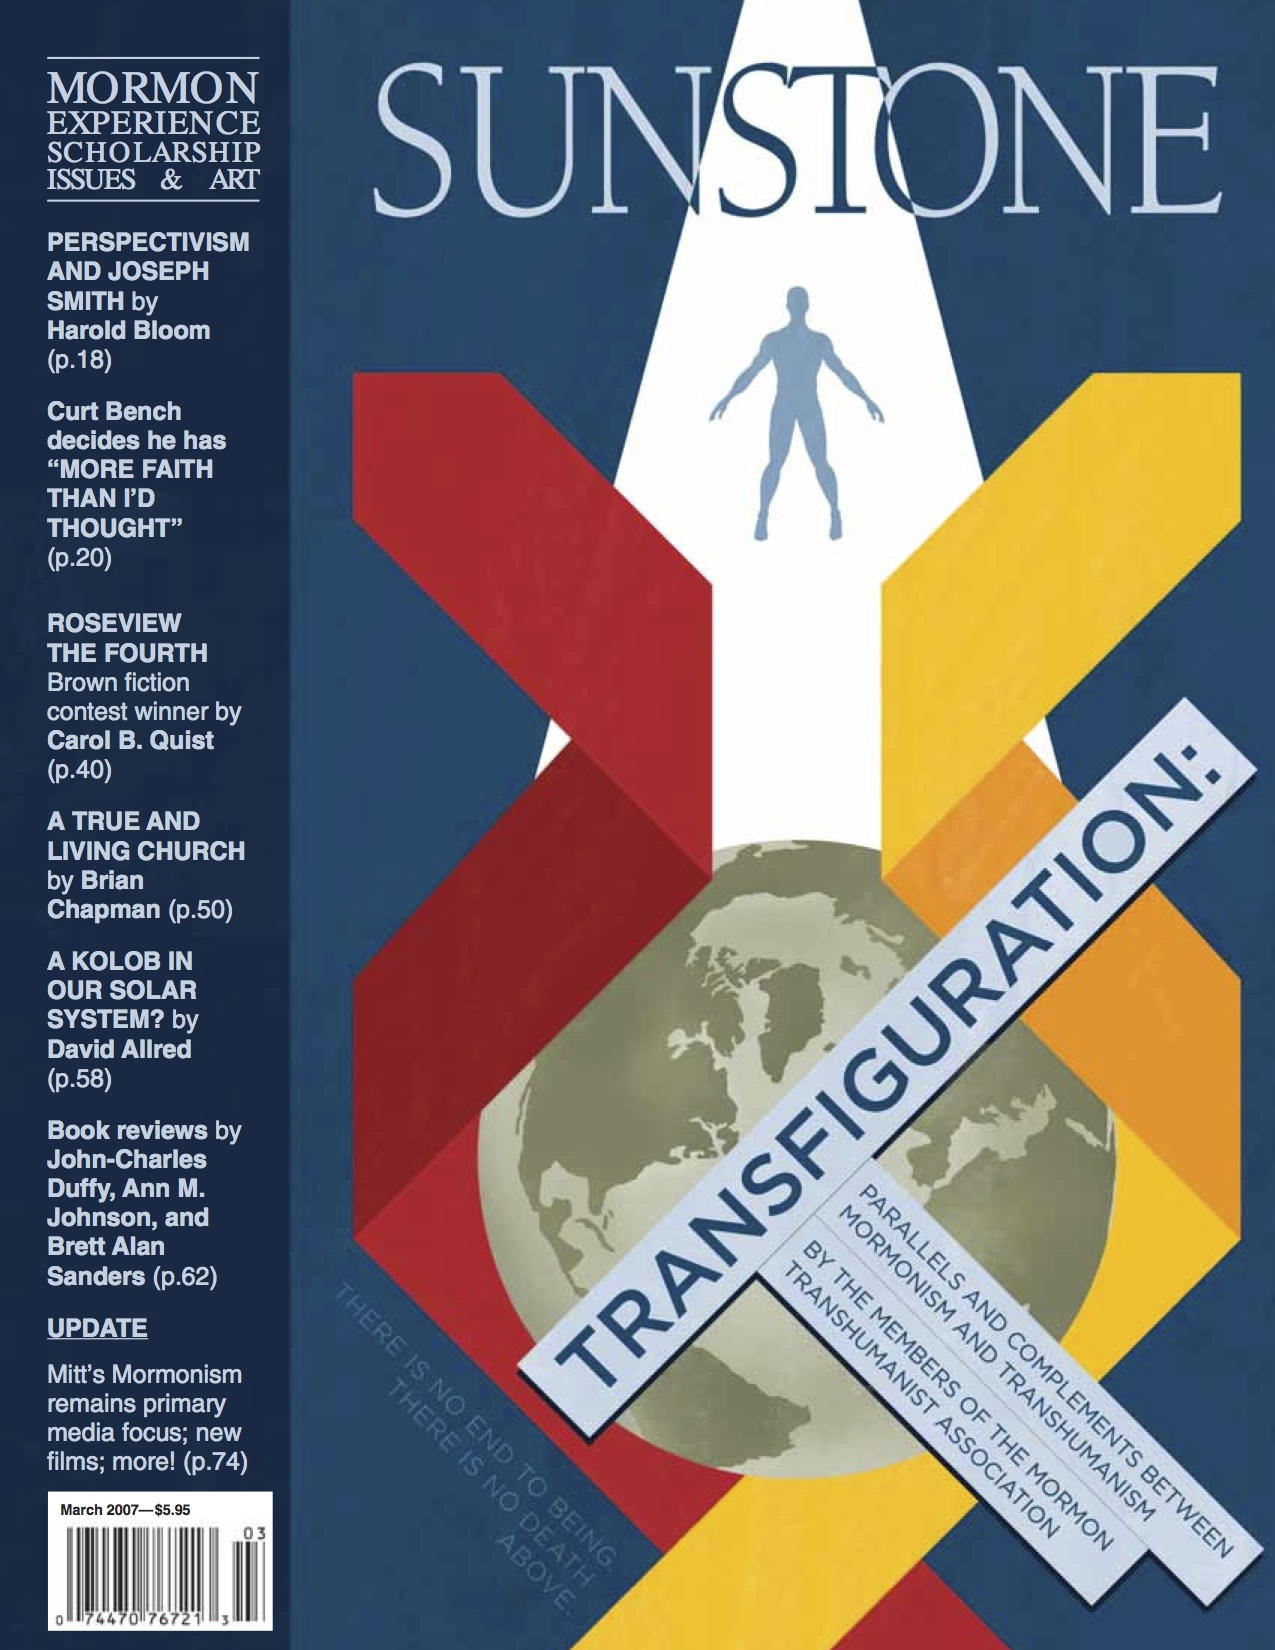 Transhumanist Parallels in Mormonism